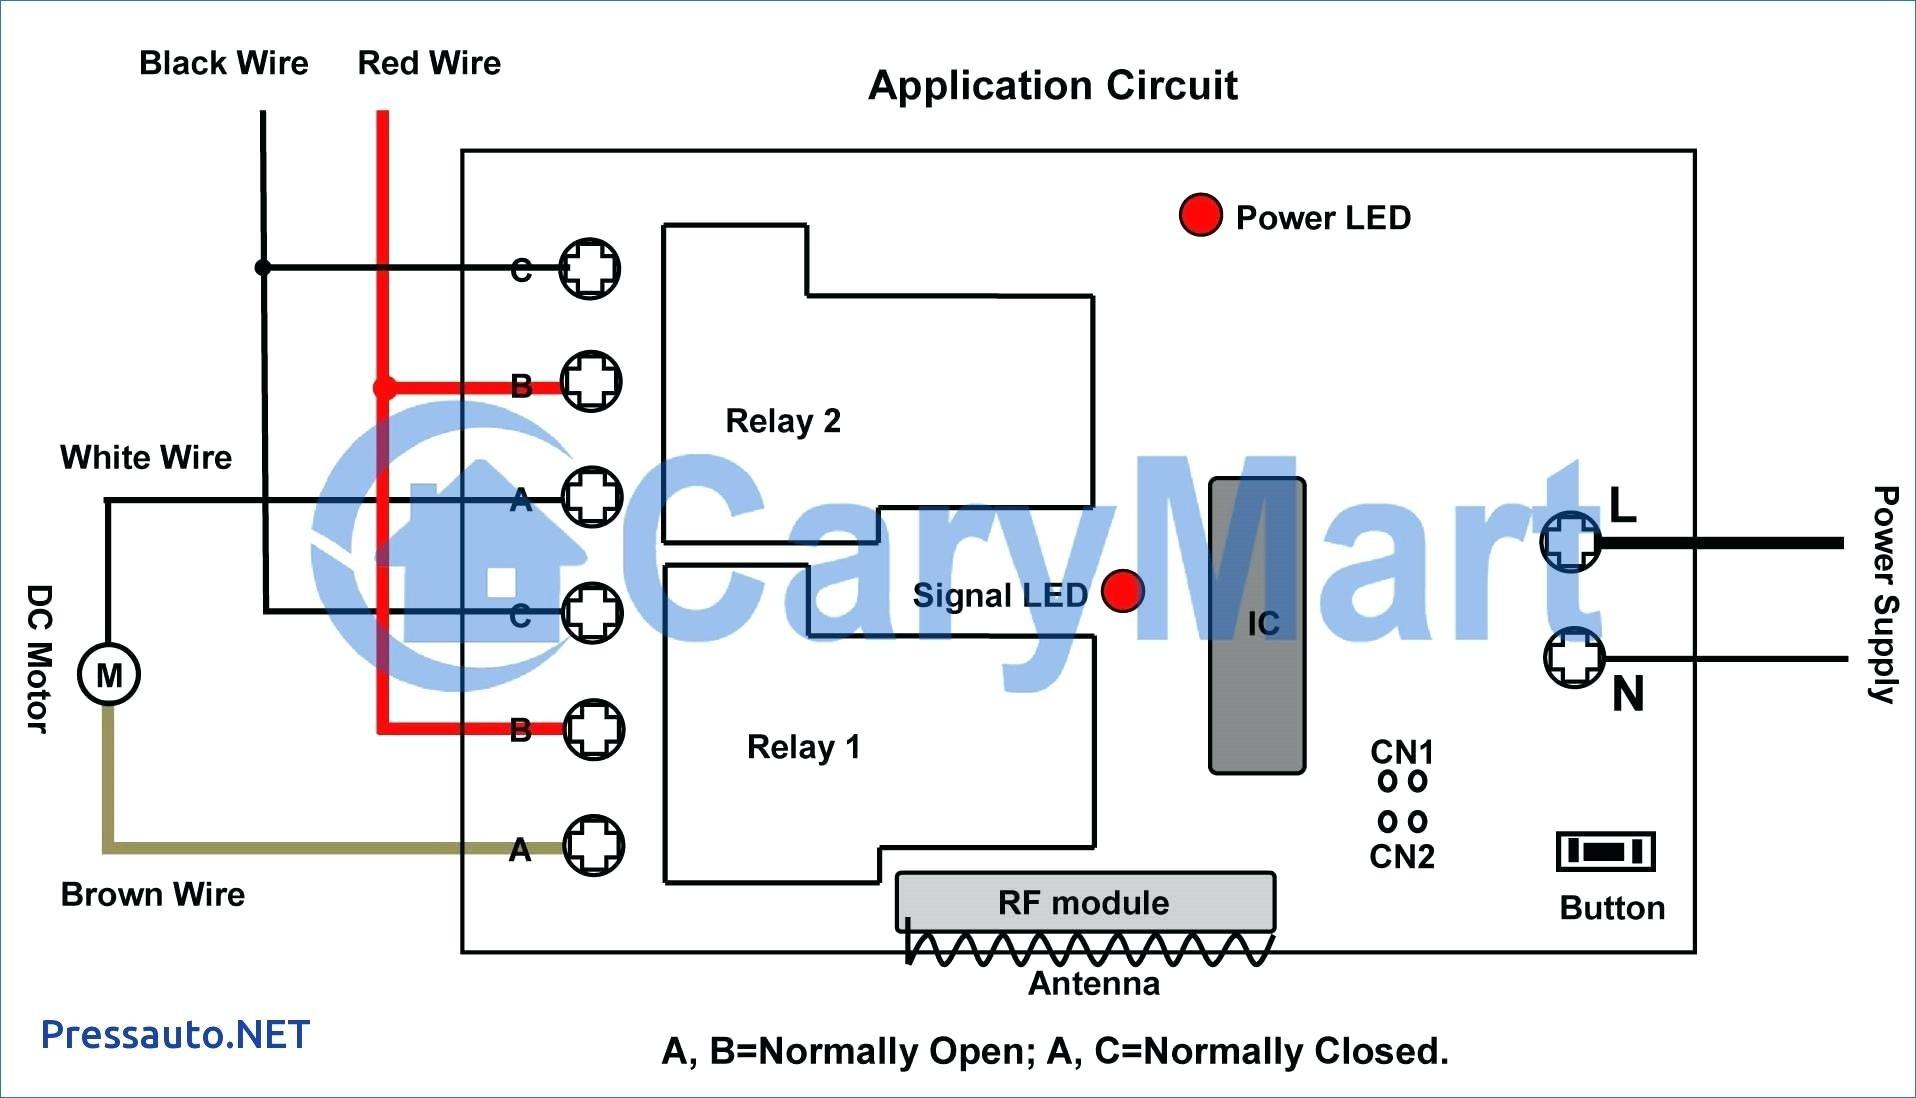 Wiring Diagram Symbols Circuit Breaker Warn Winch Switch M8000 Image Net And Random 2